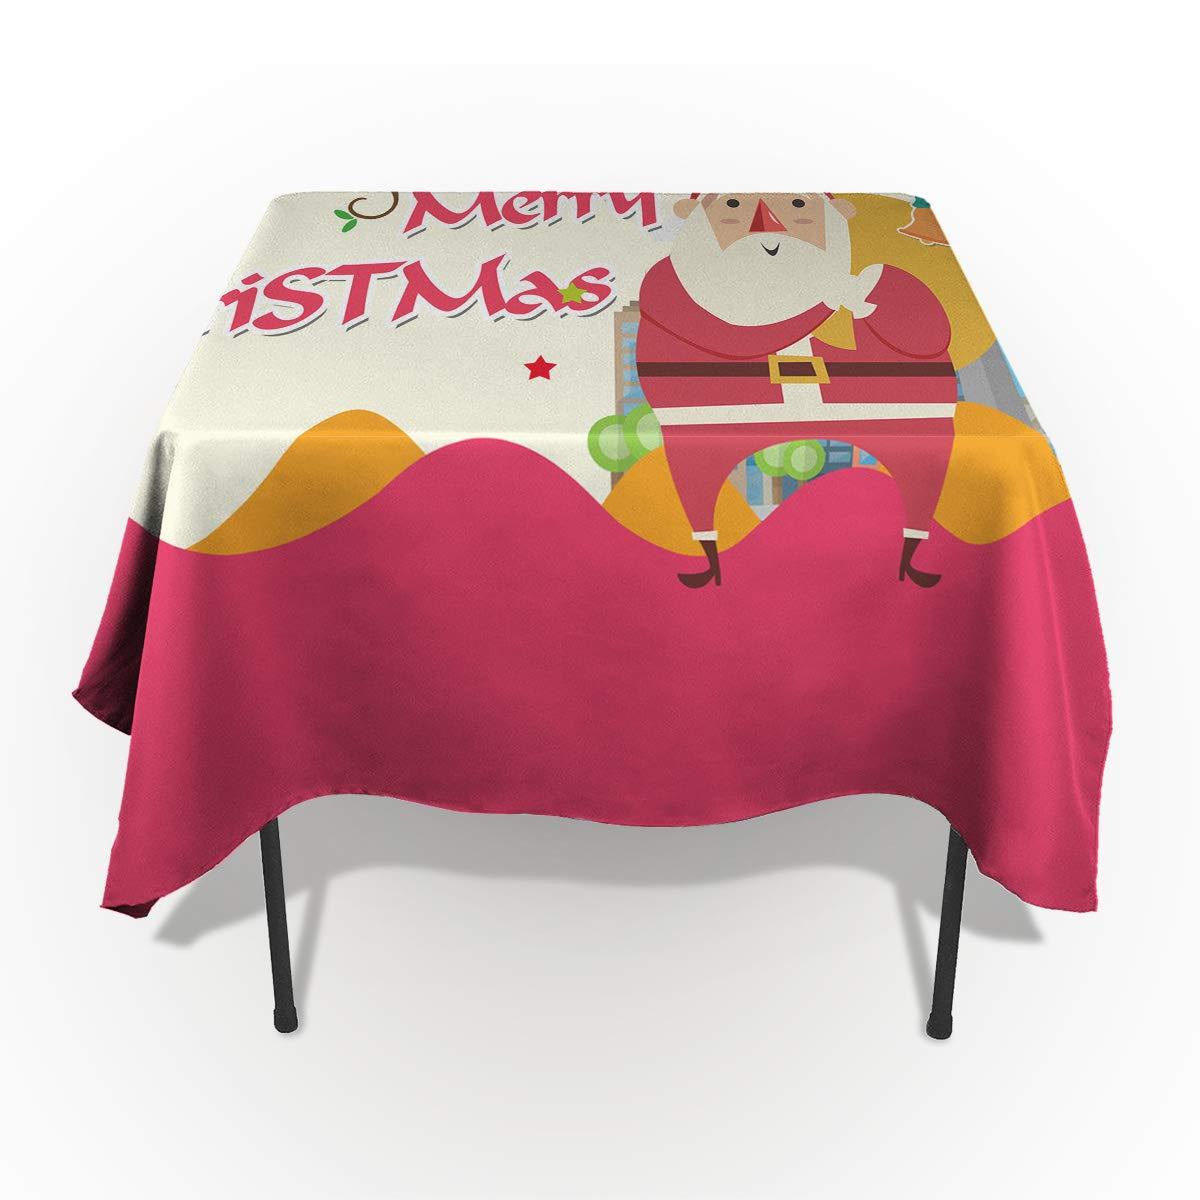 Fantasy Star 長方形ポリエステルテーブルクロス クリスマステーマ 装飾 鹿のギフト 家 テーブルクロス 洗濯機洗い可 テーブルカバー 装飾テーブルクロス キッチン ダイニングパーティー 60